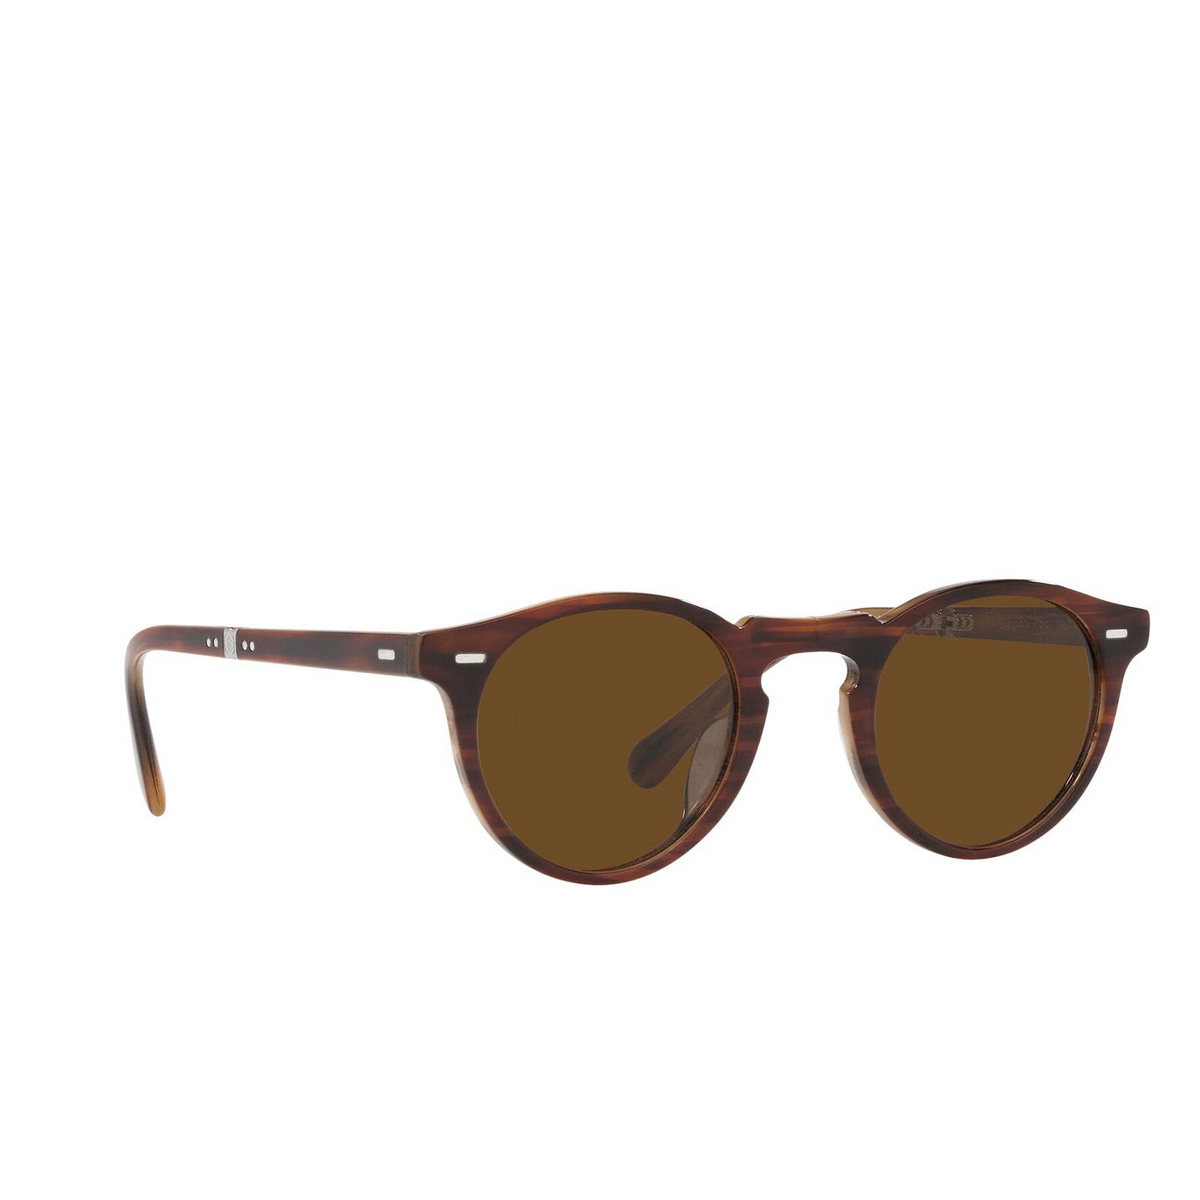 Oliver Peoples® Round Sunglasses: Gregory Peck 1962 OV5456SU color Amaretto / Striped Honey 131057 - three-quarters view.